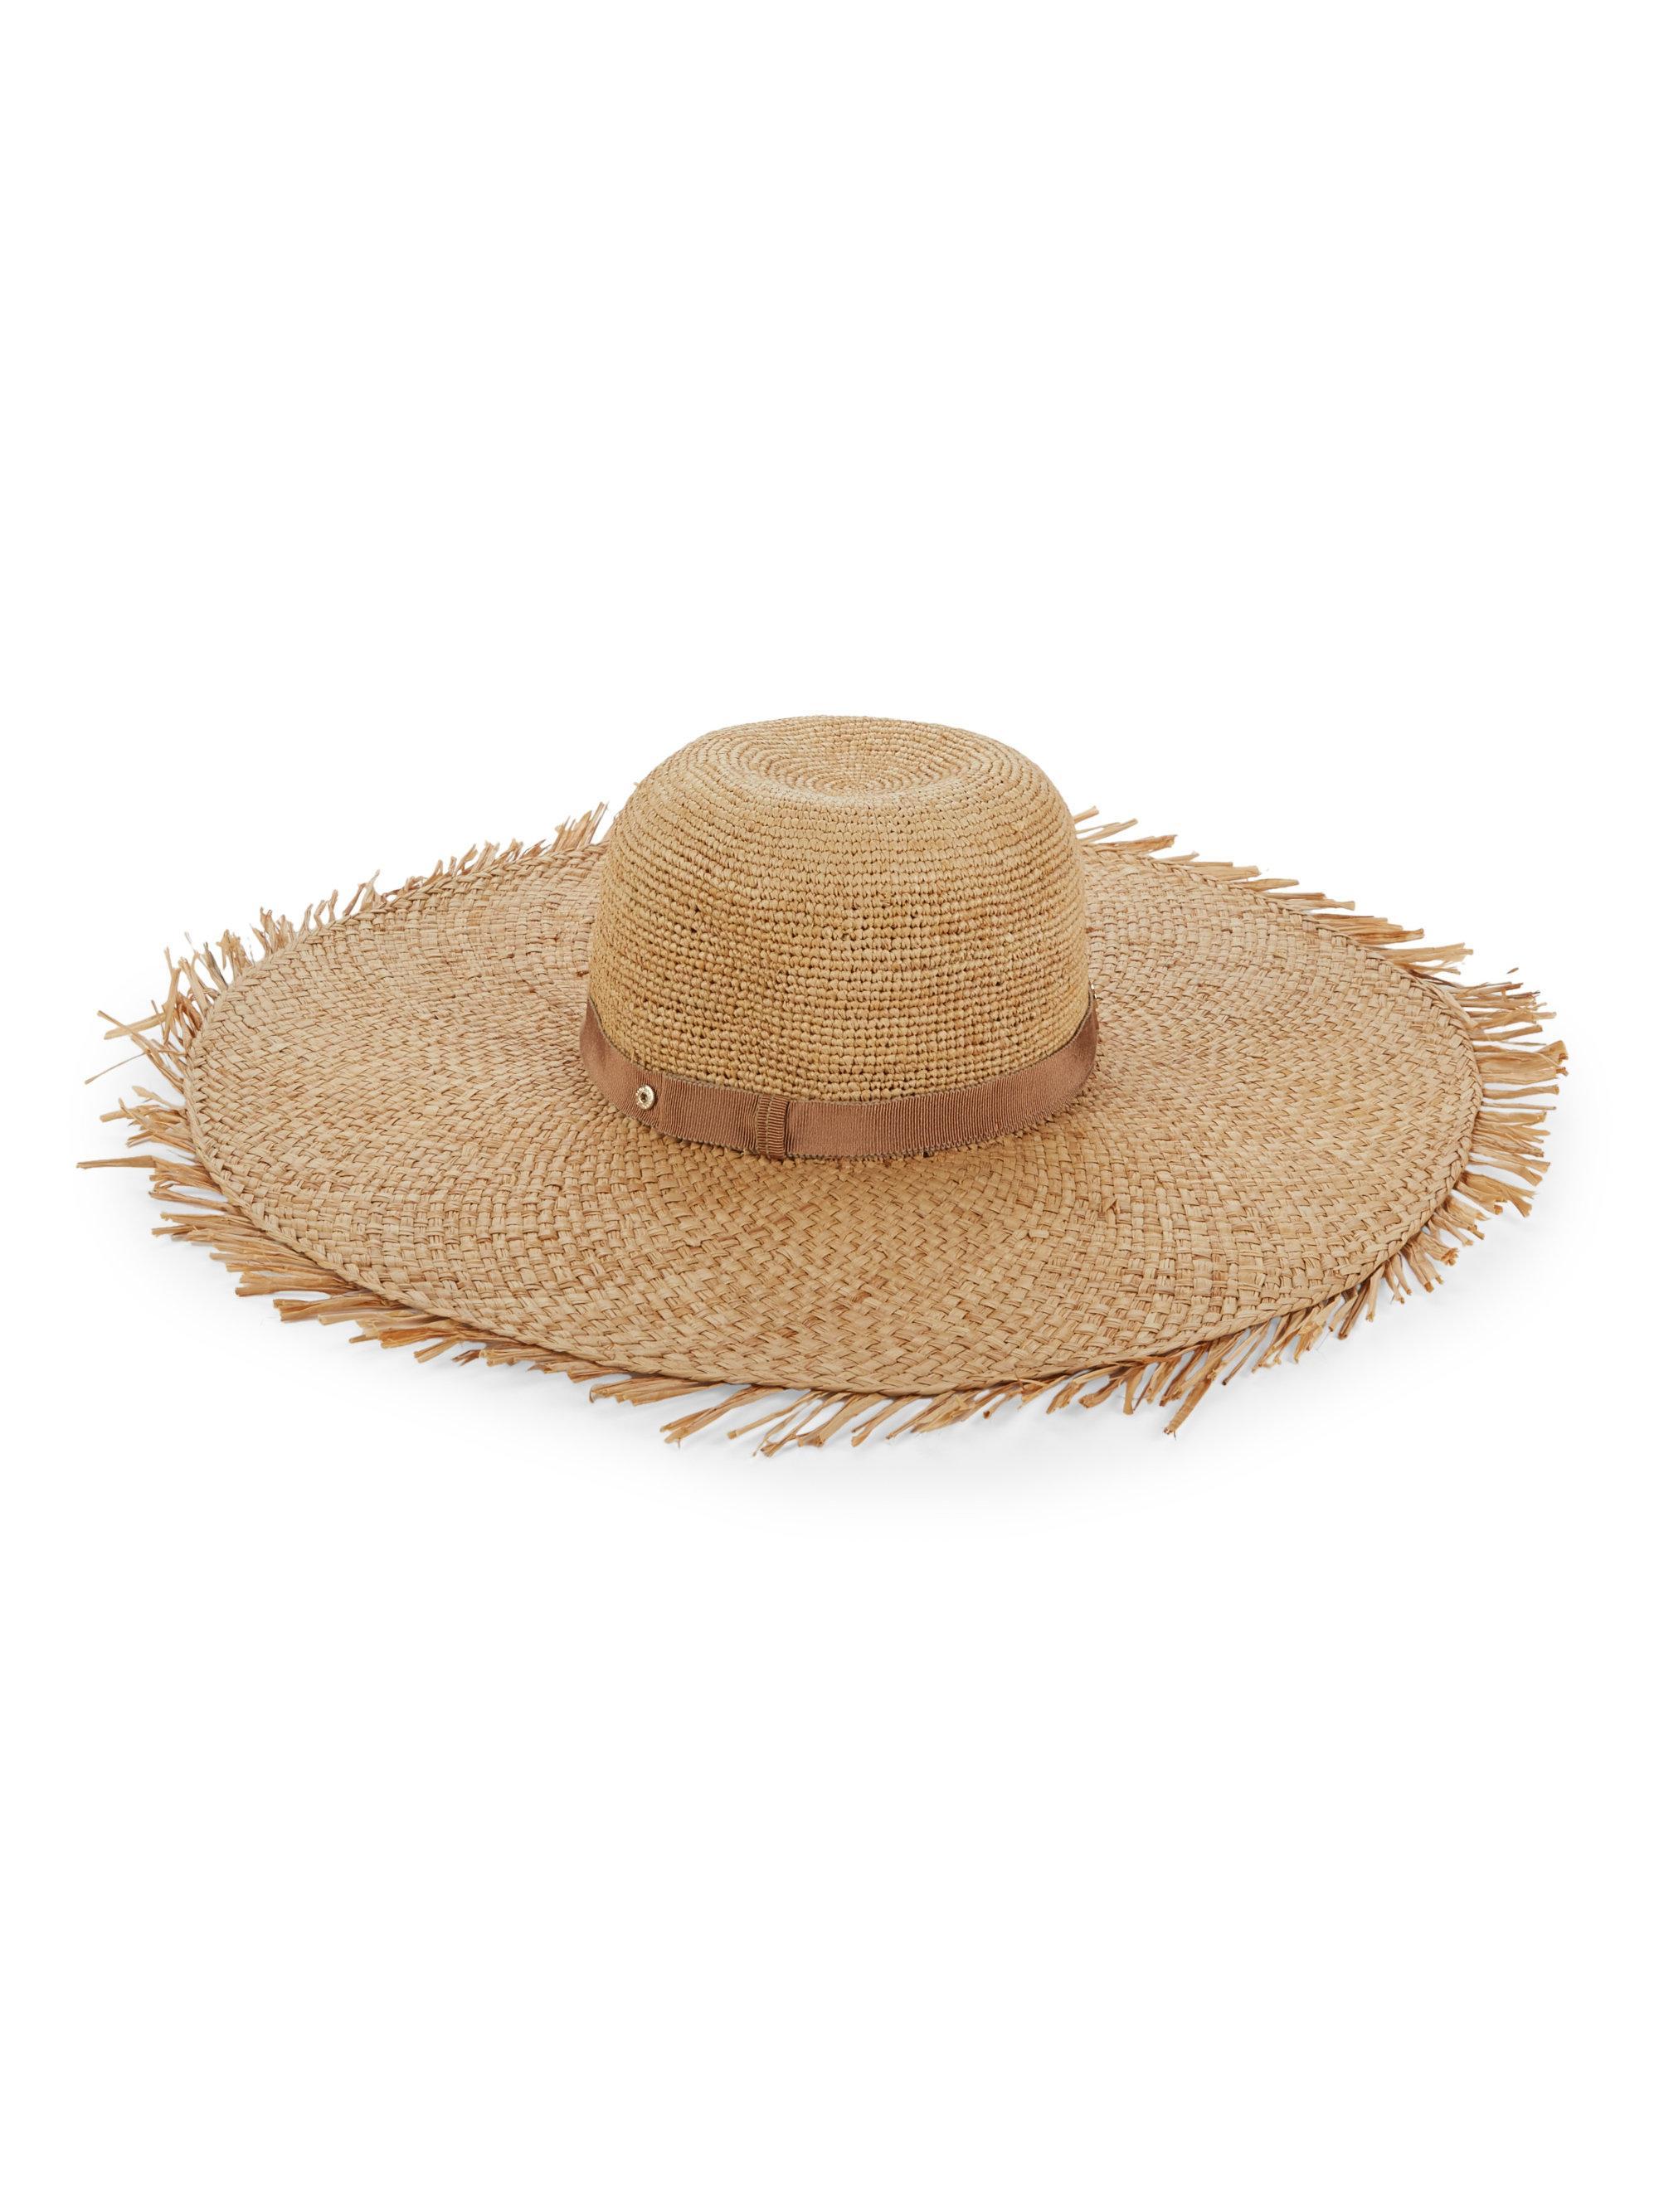 Accesorios - Sombreros Inverni ZeOFTA8Tm